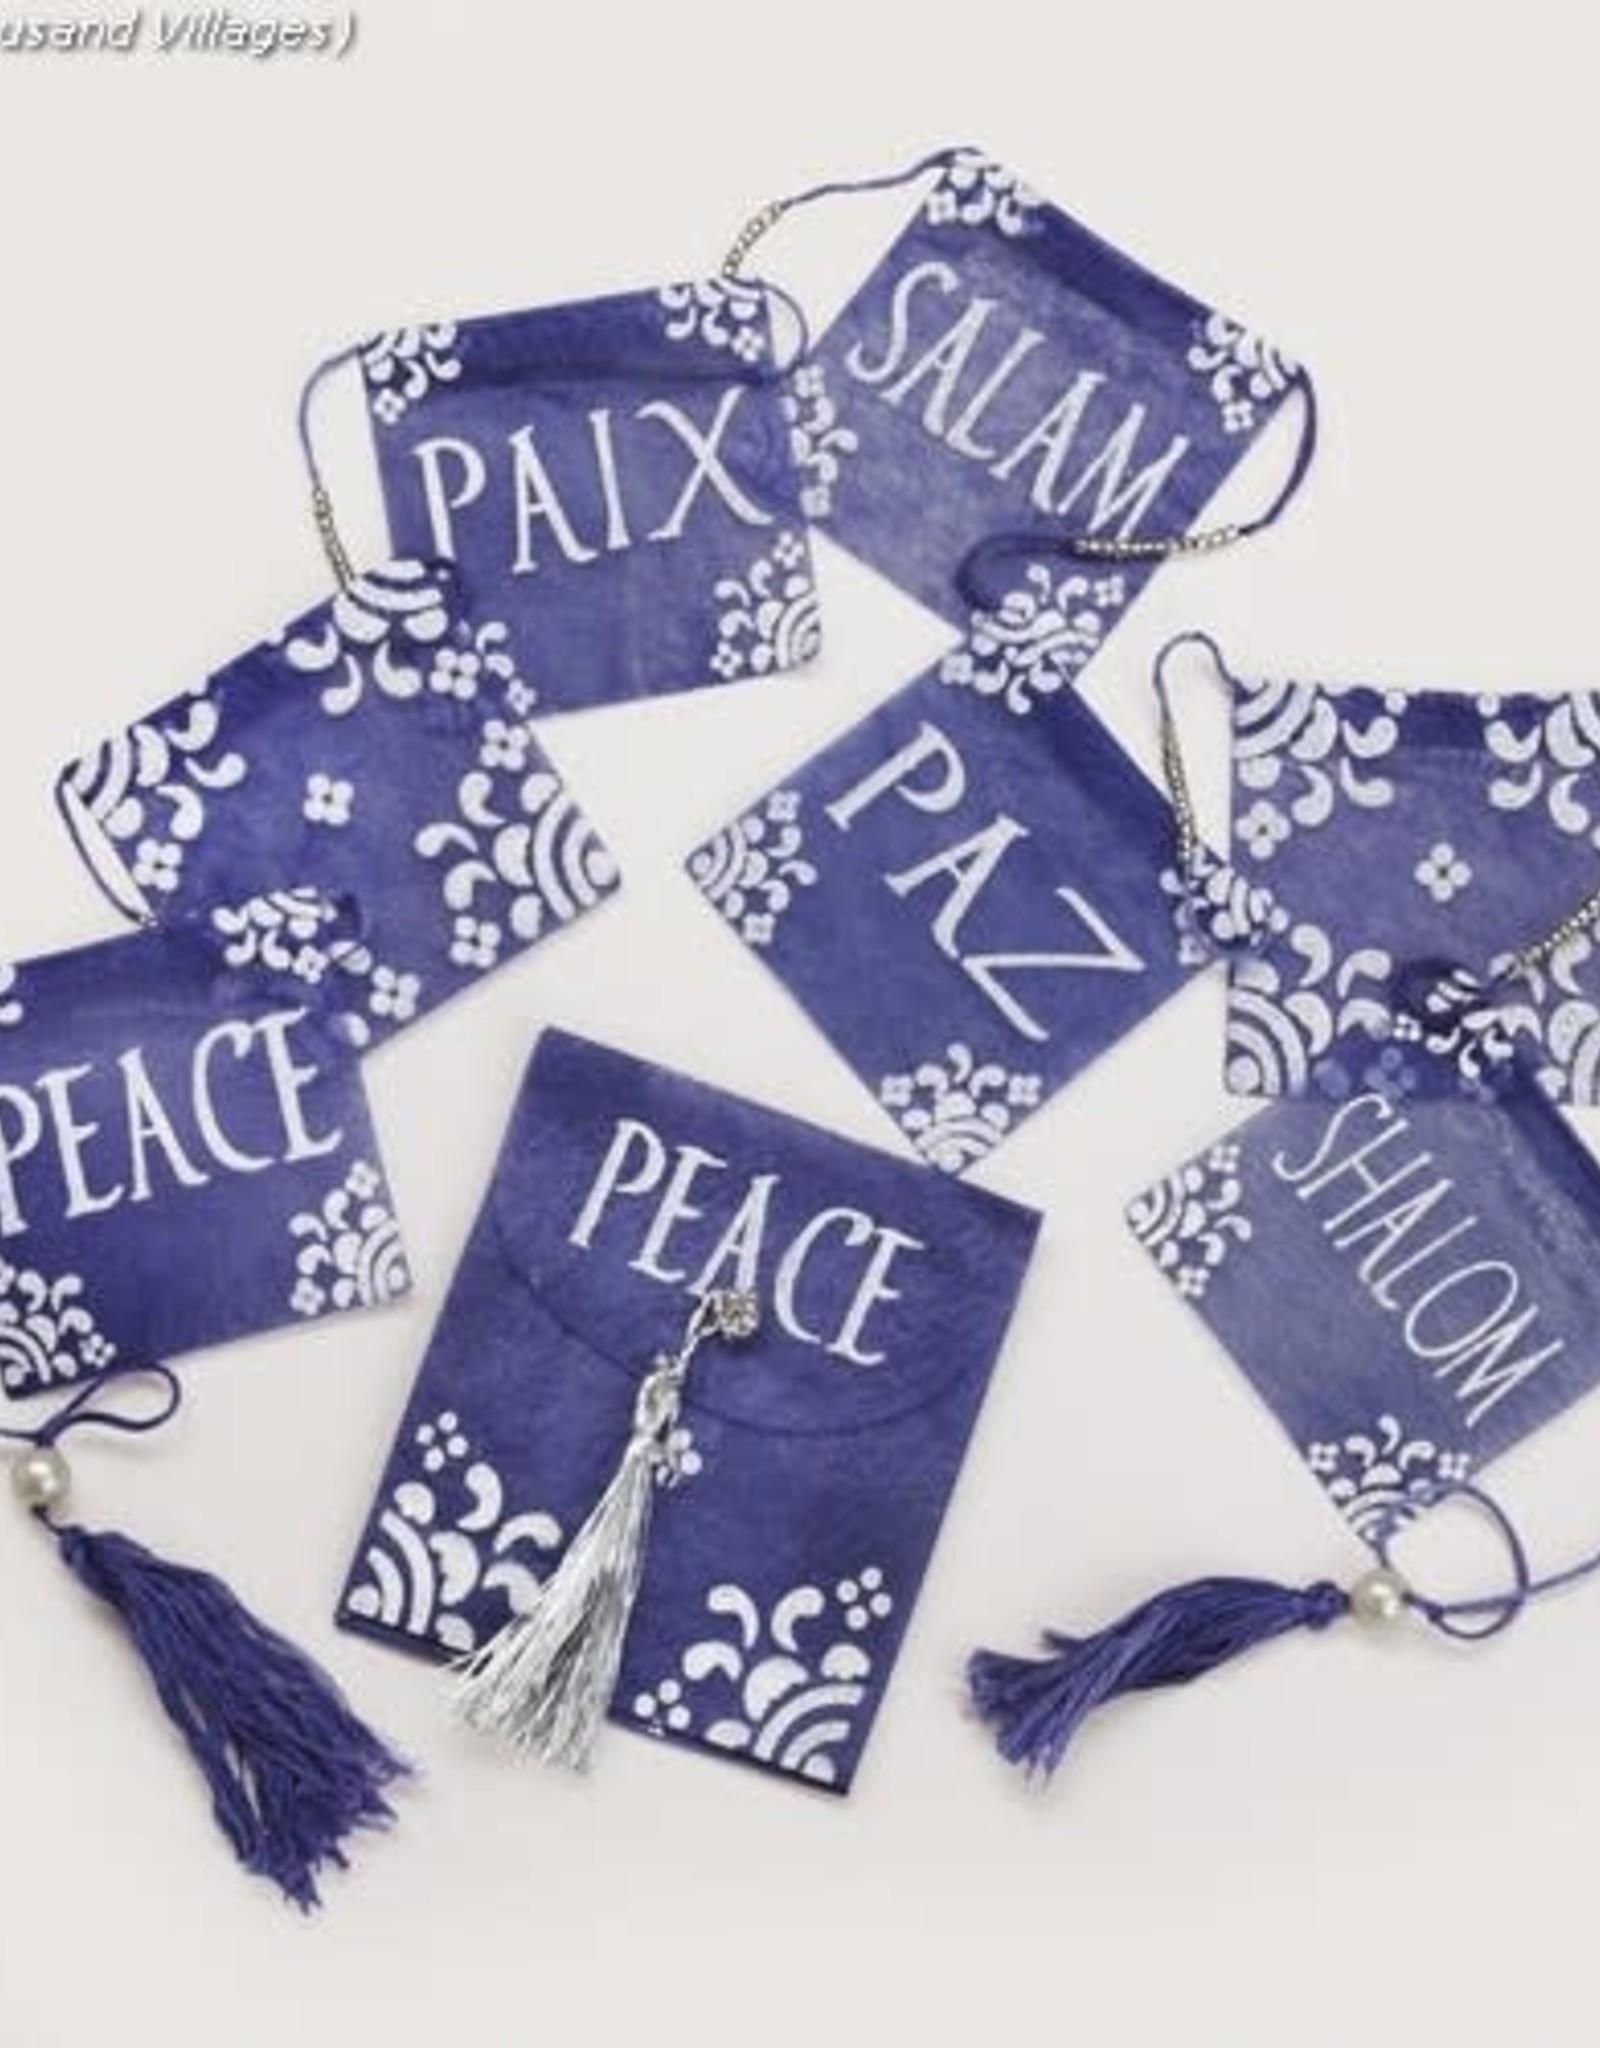 Peace Flag Garland